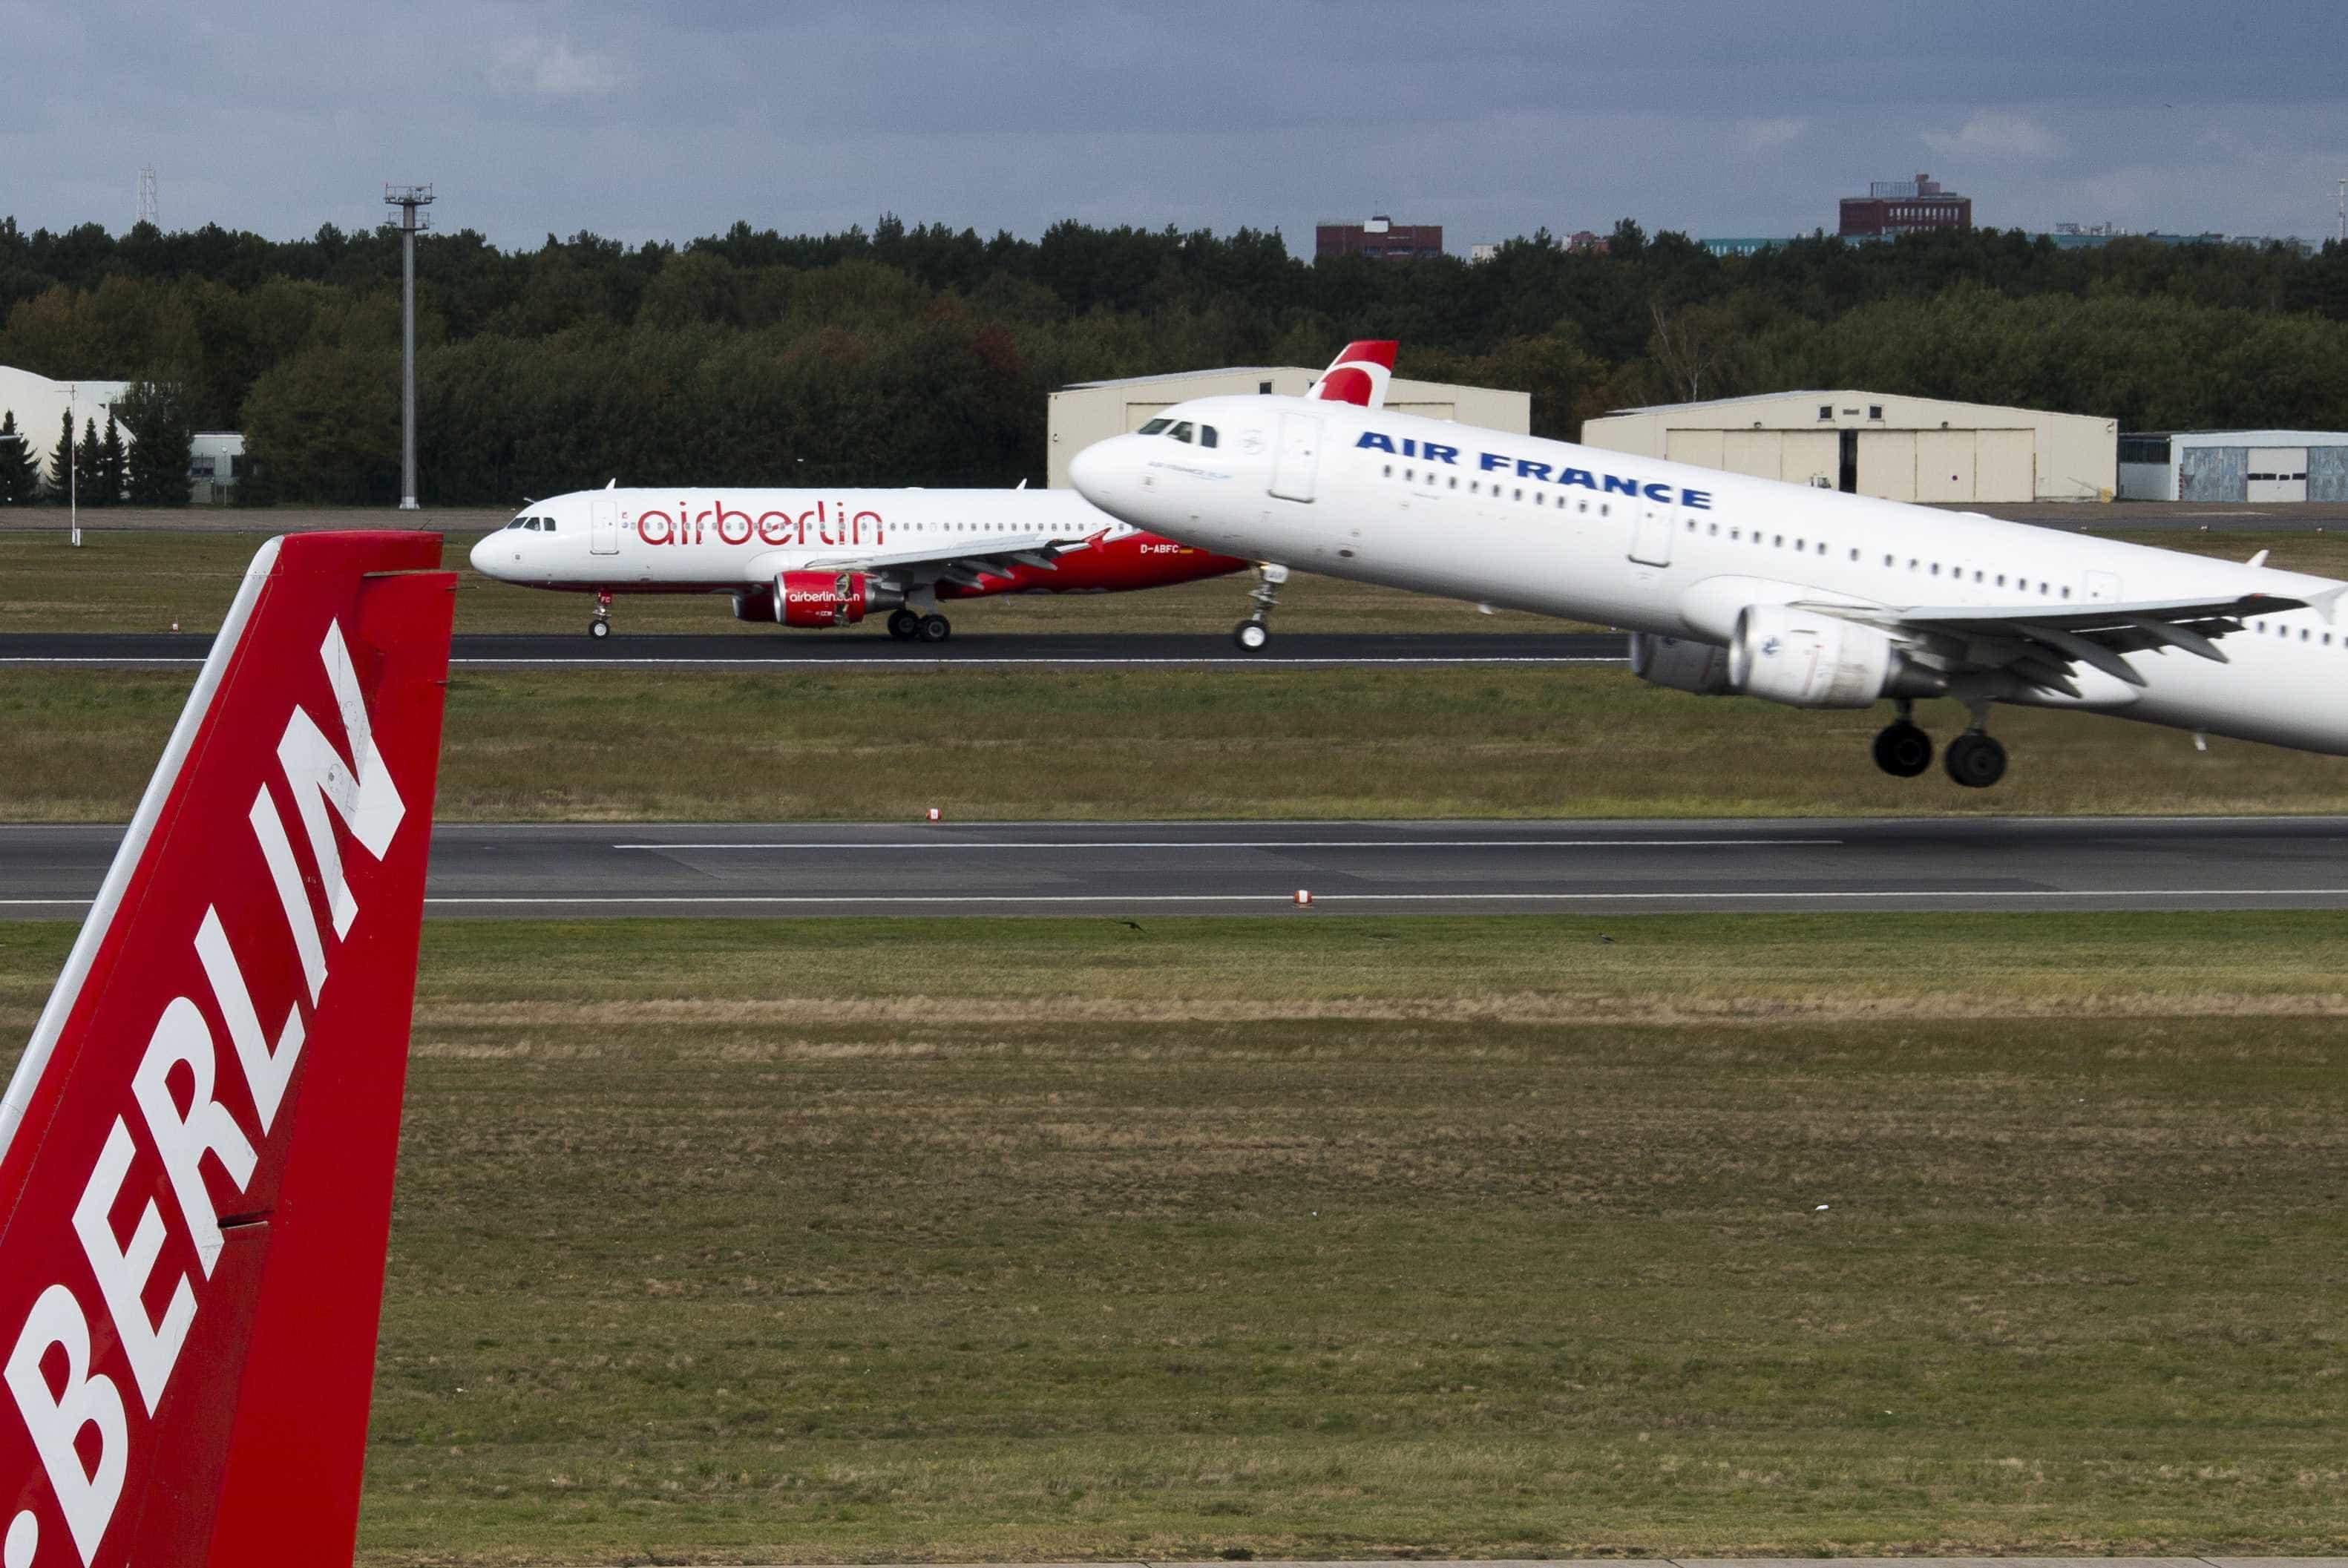 Abertura de novo aeroporto internacional de Berlim volta a ser adiada